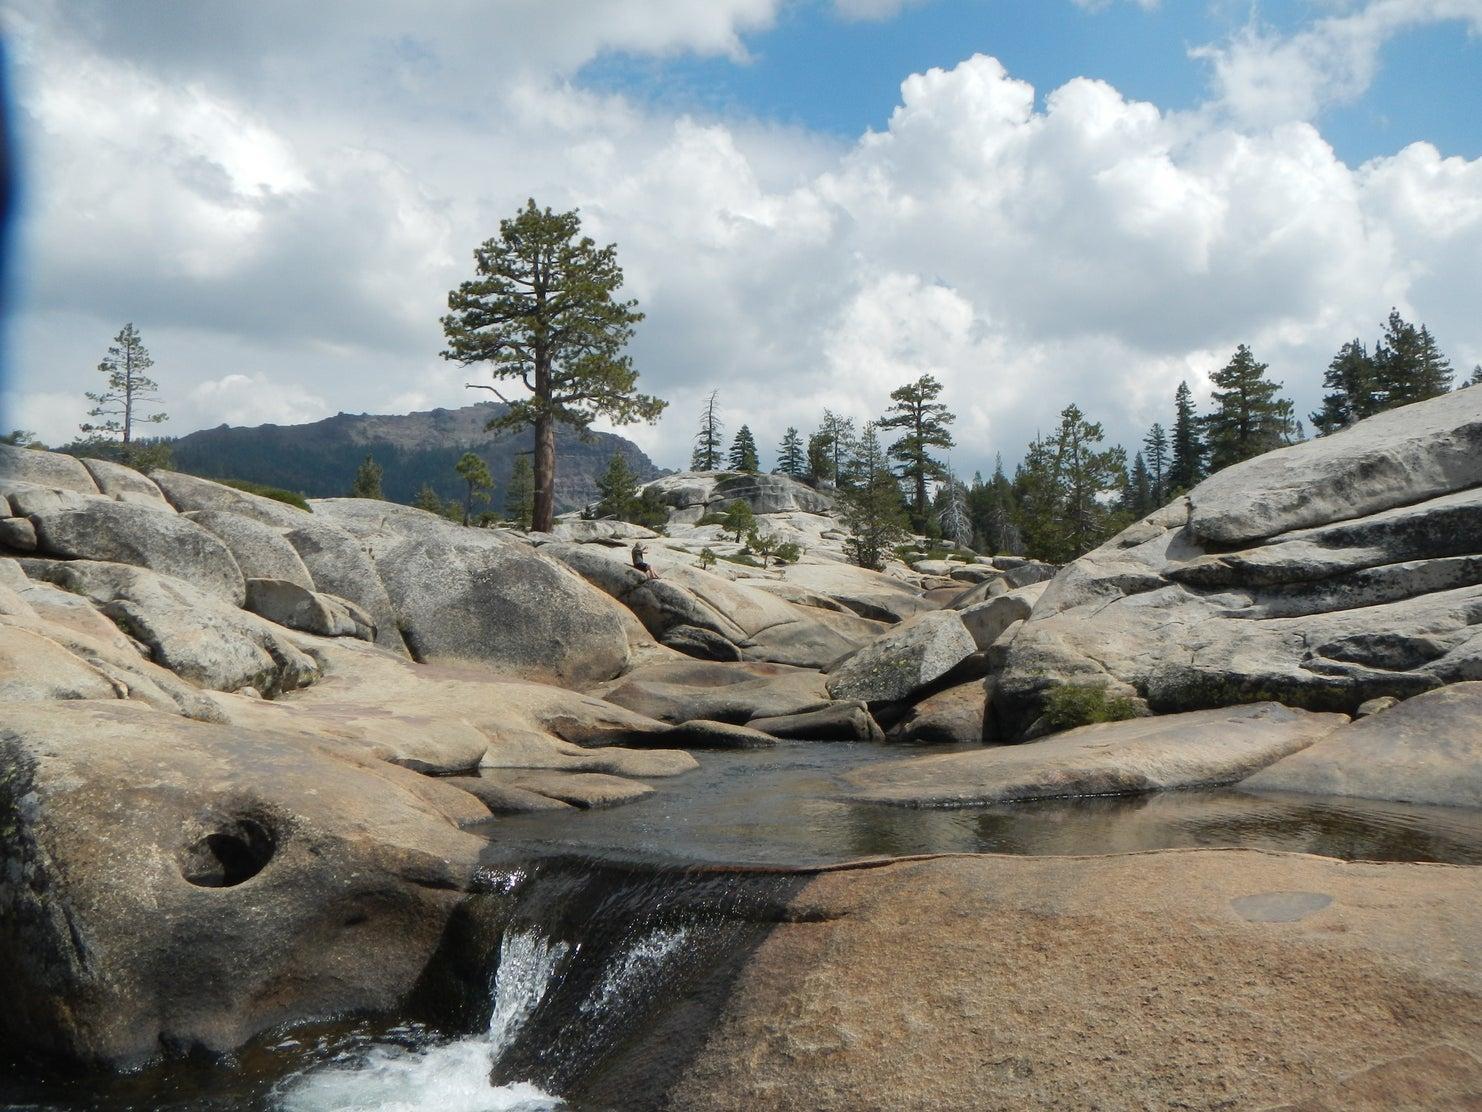 waterfall off granite rocks